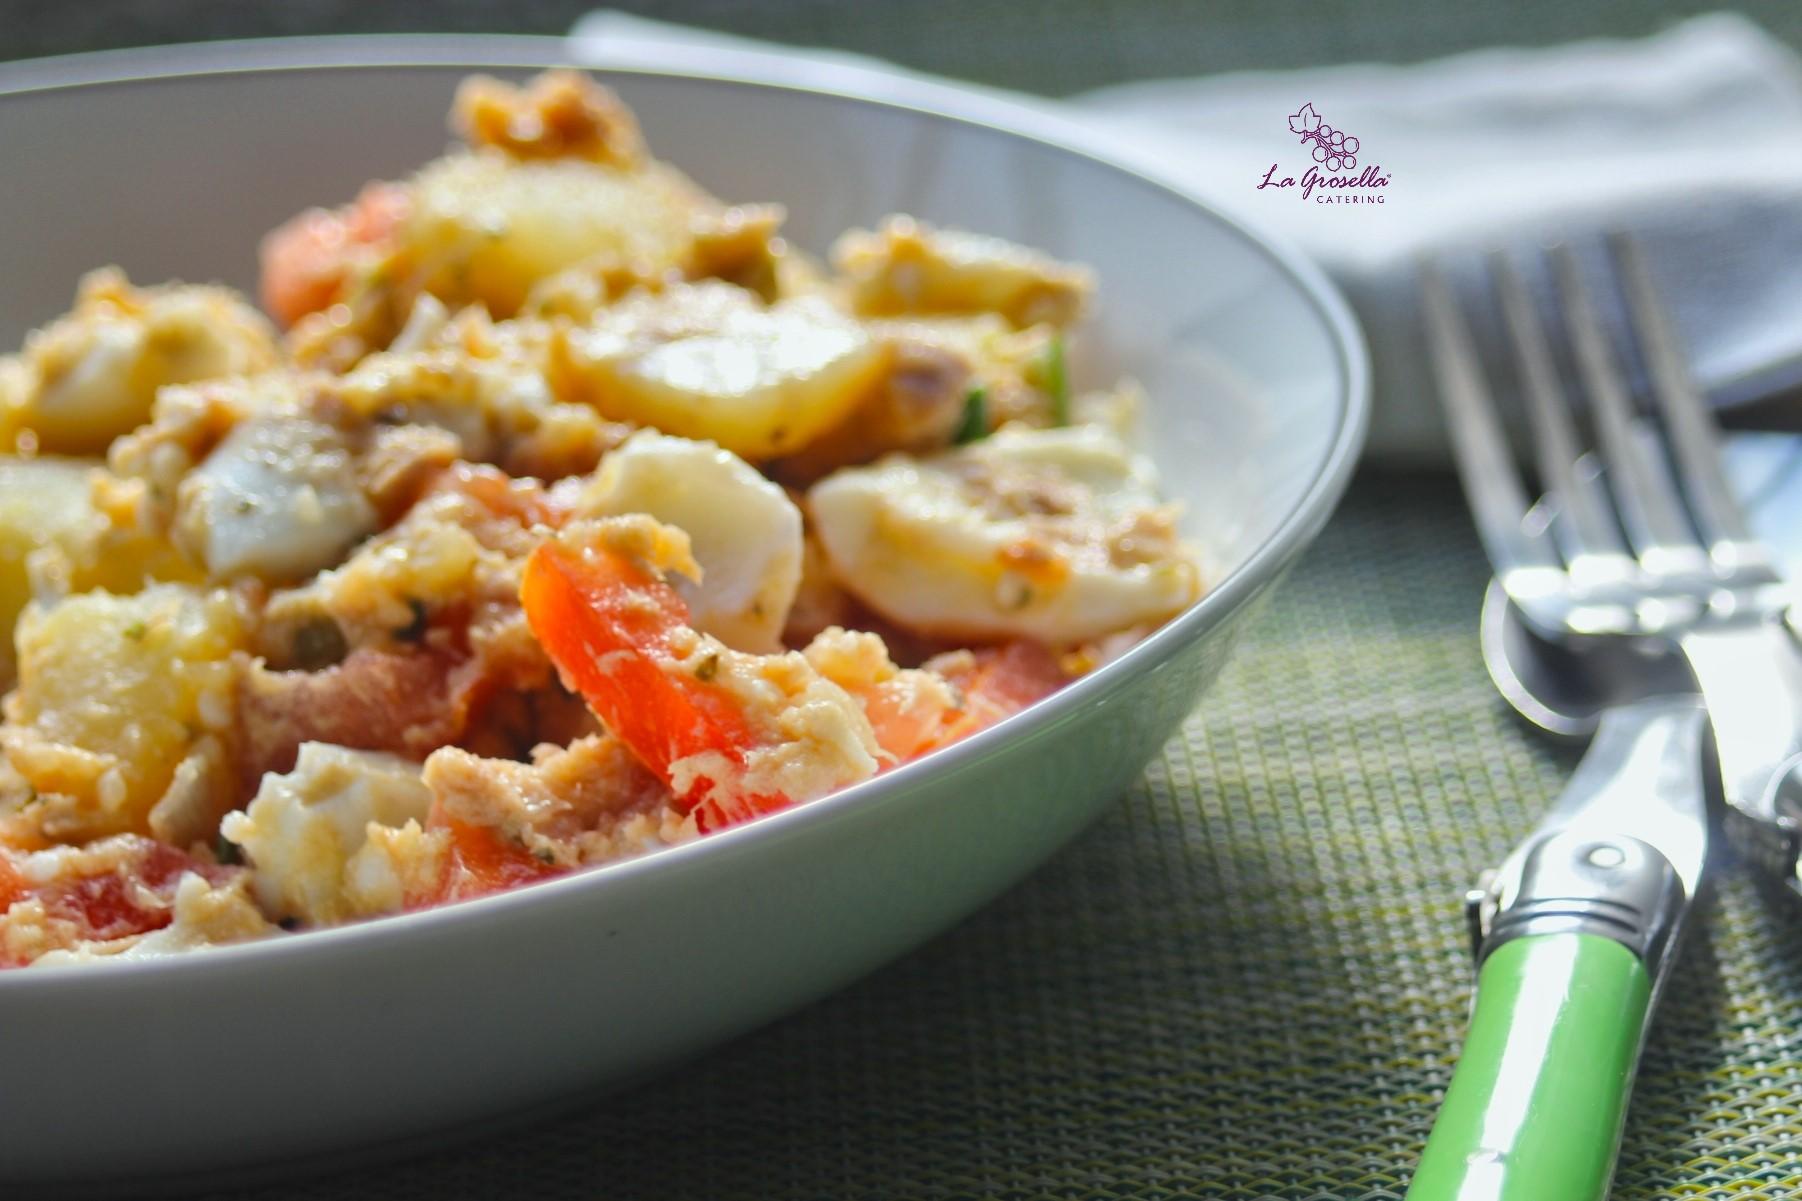 Ensalada de patata con atún